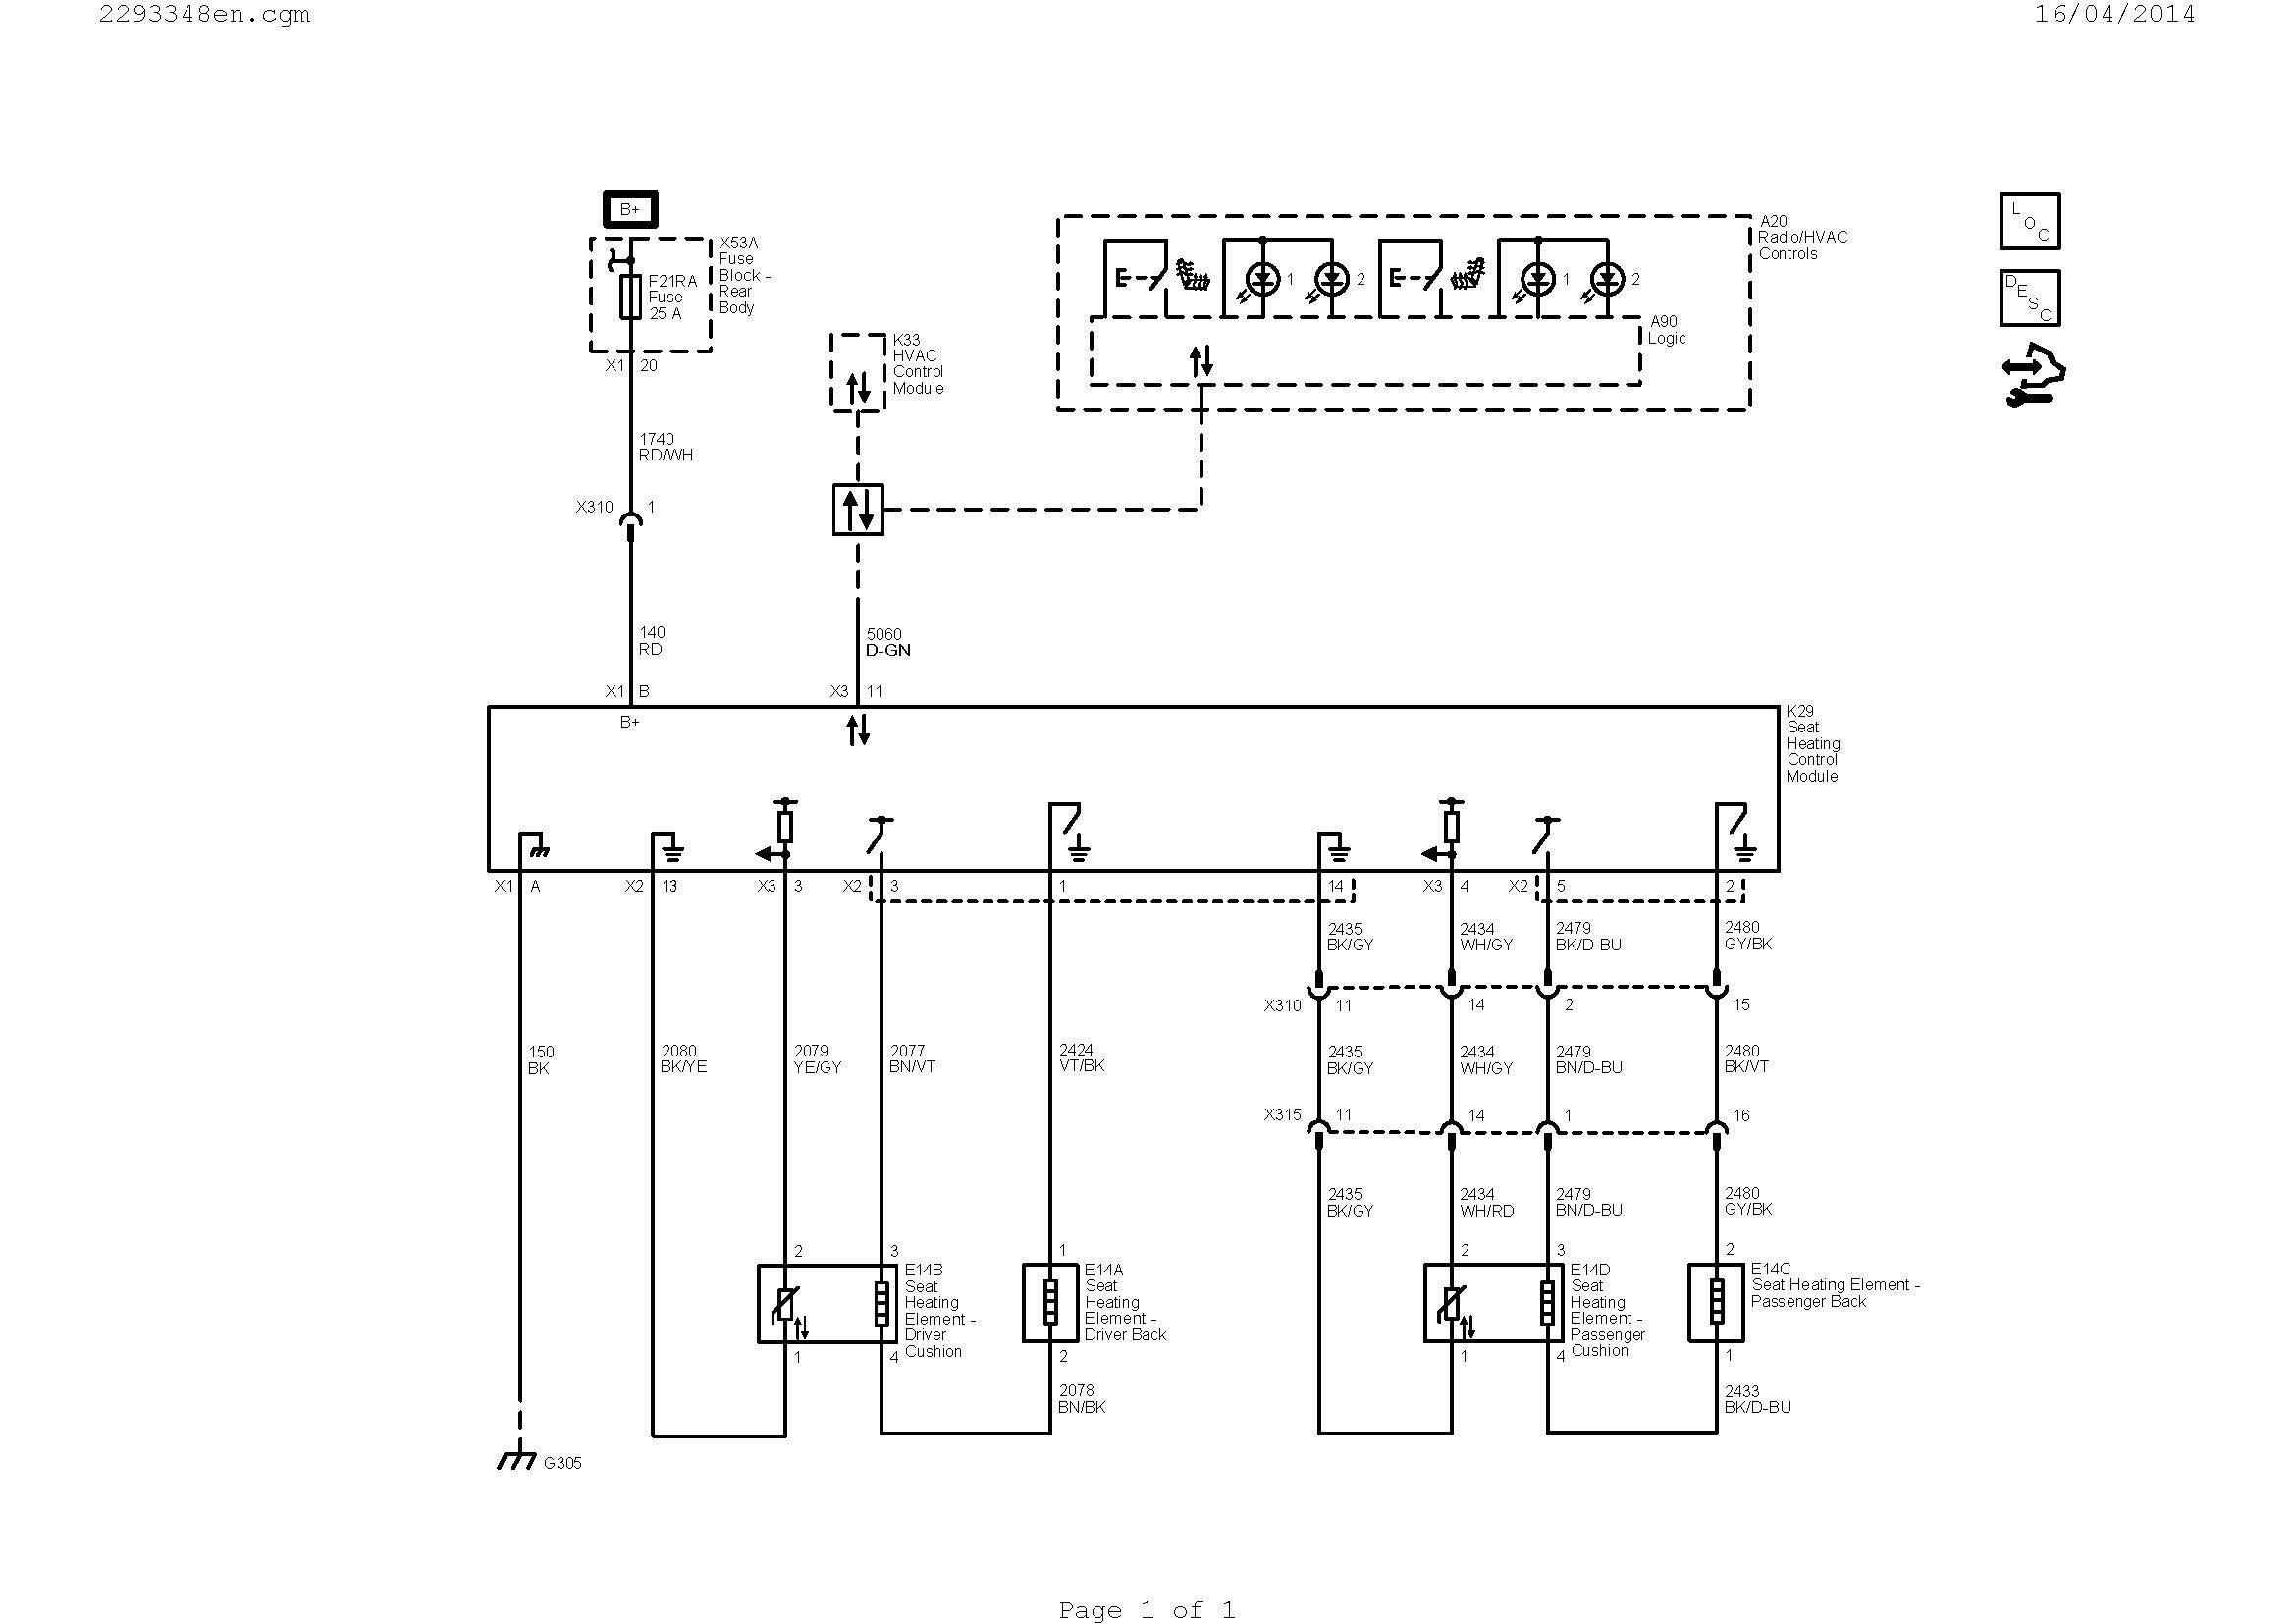 Wiring Diagram Car Ac New Wiring Diagram Ac Valid Hvac Diagram Best Hvac Diagram 0d